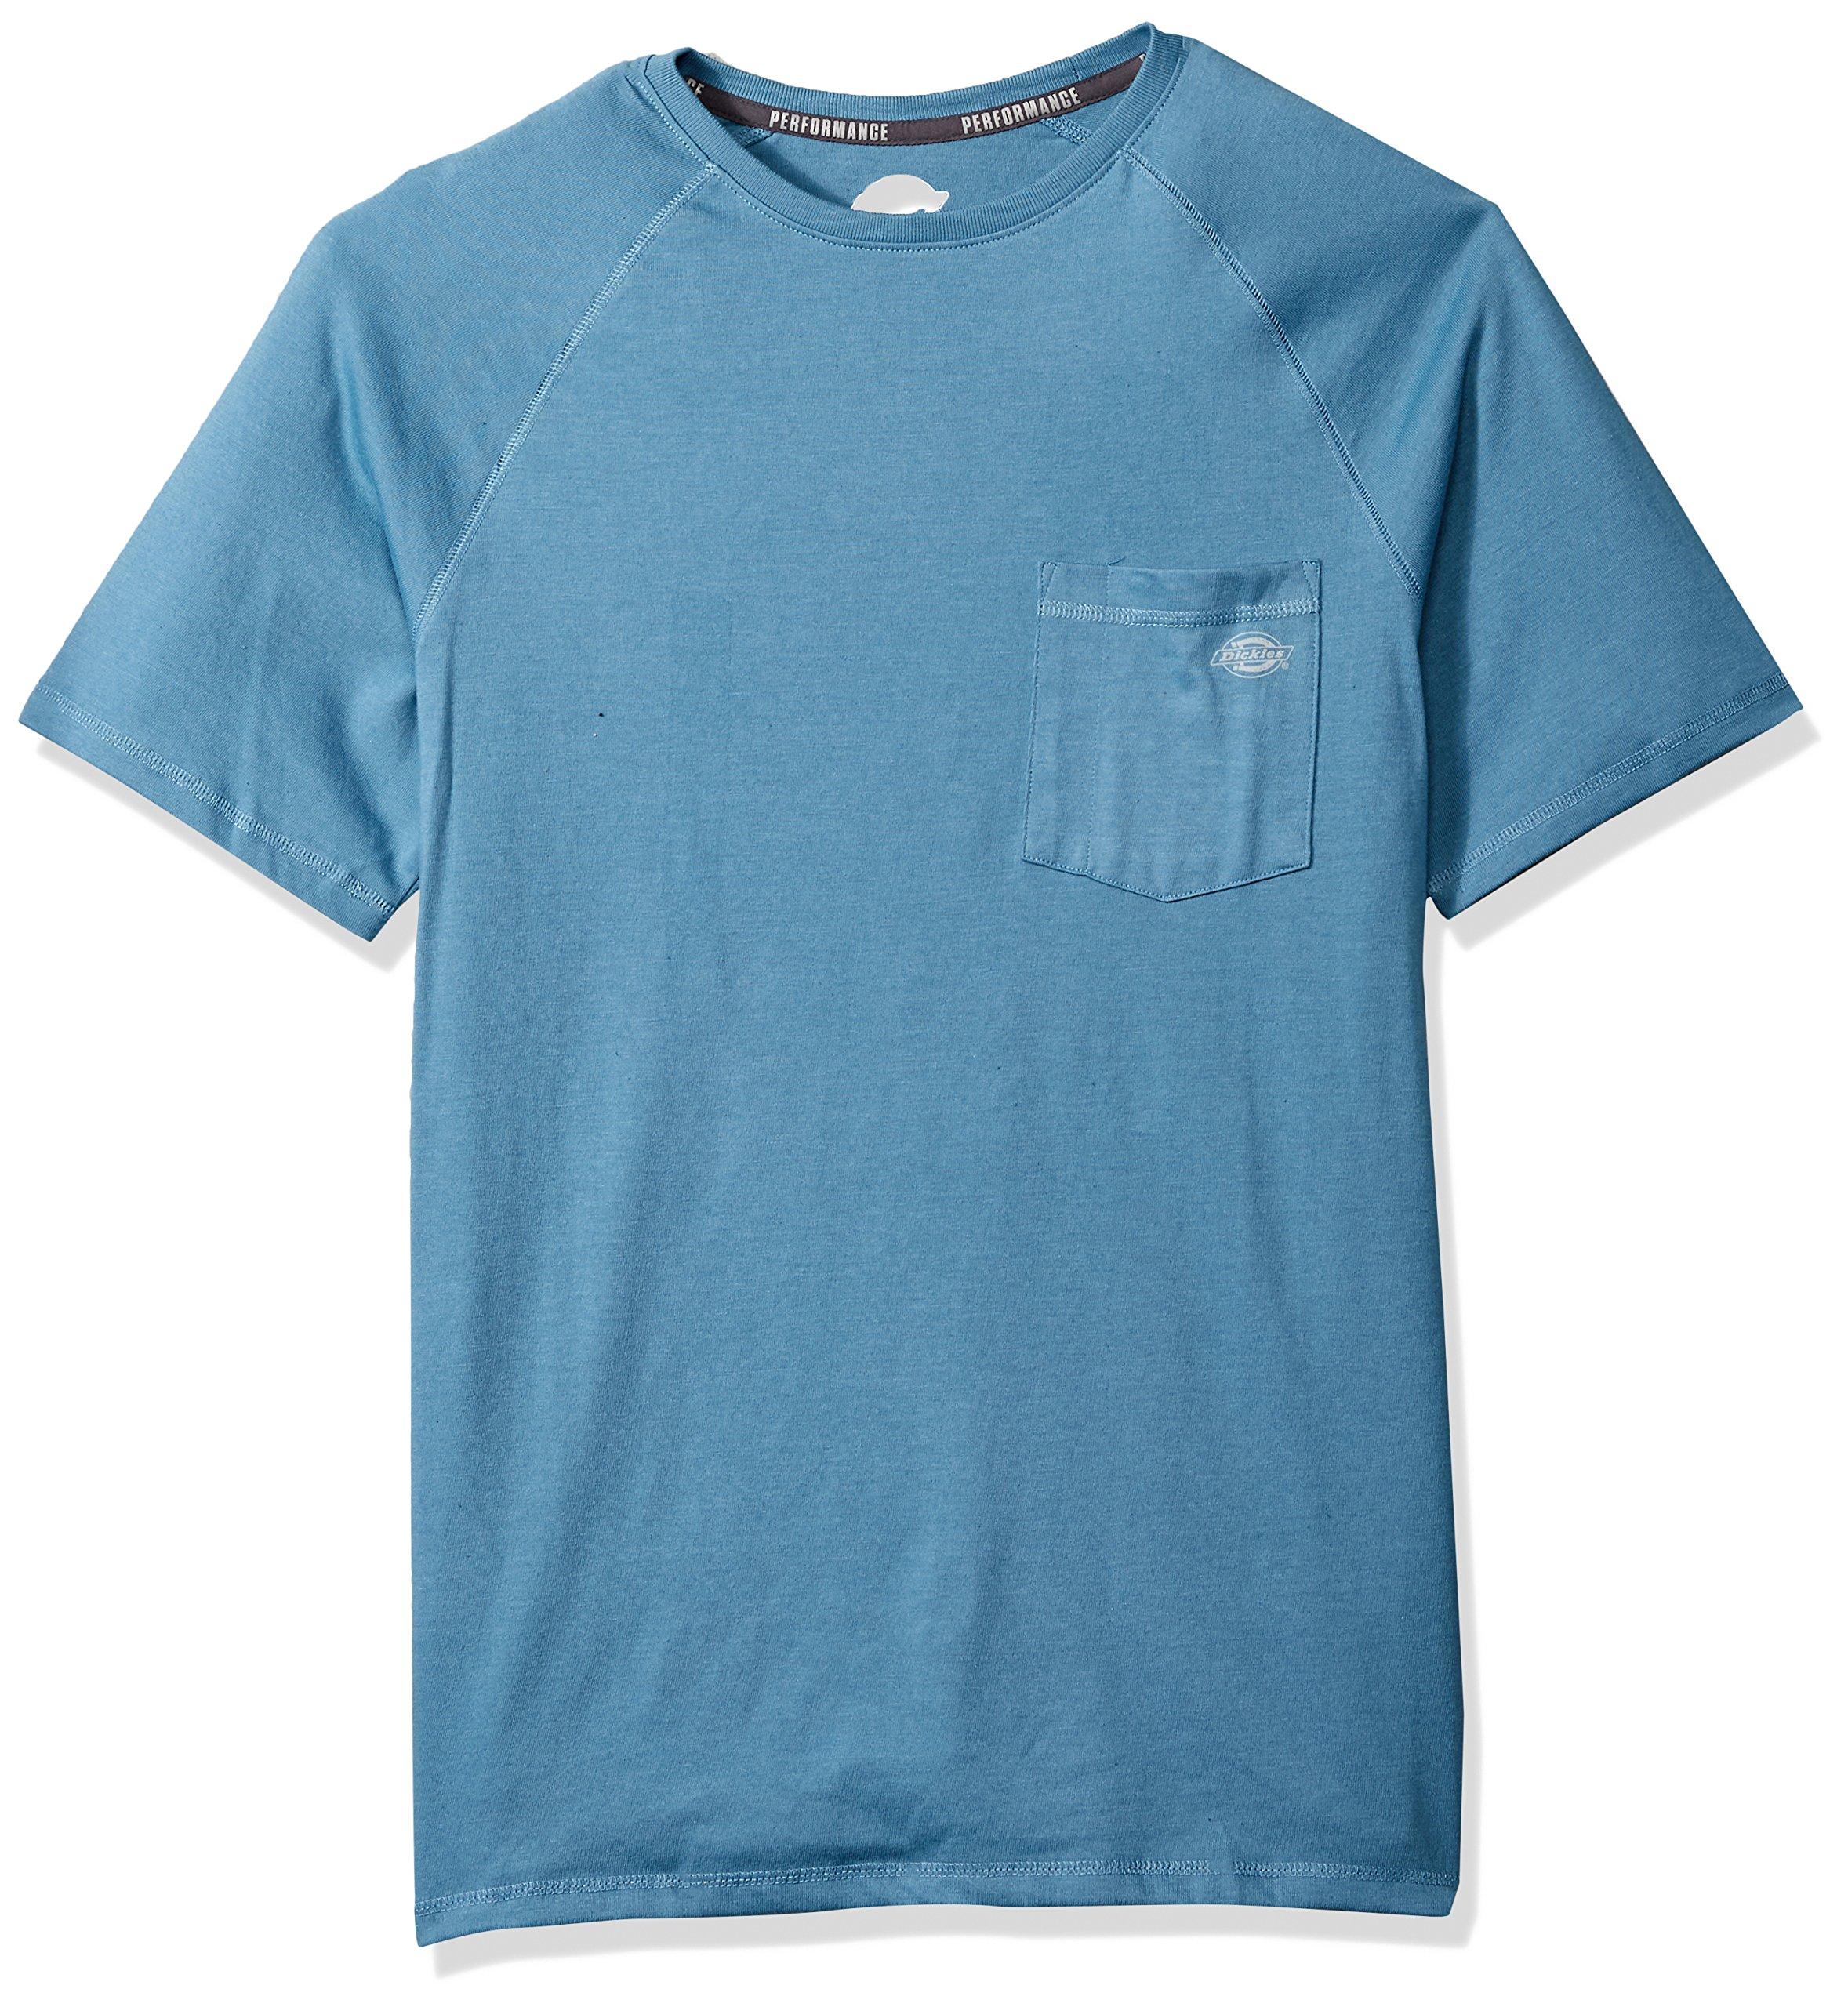 Dickies Men's Short Sleeve Performance Cooling Tee, Dusty Blue, XL